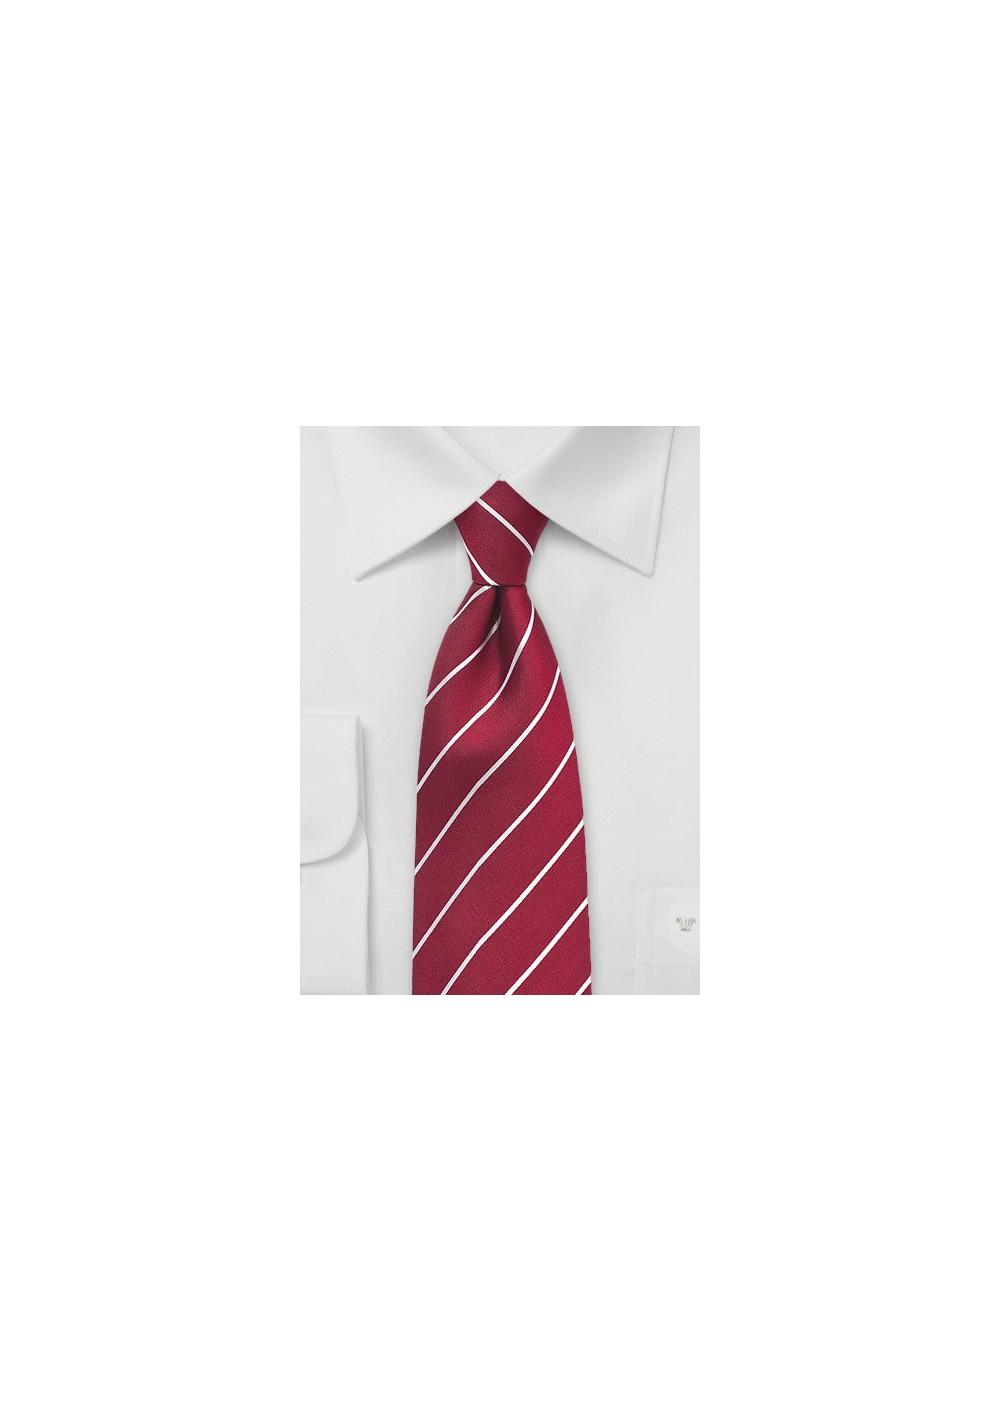 Striped Tie in Chili Pepper Red